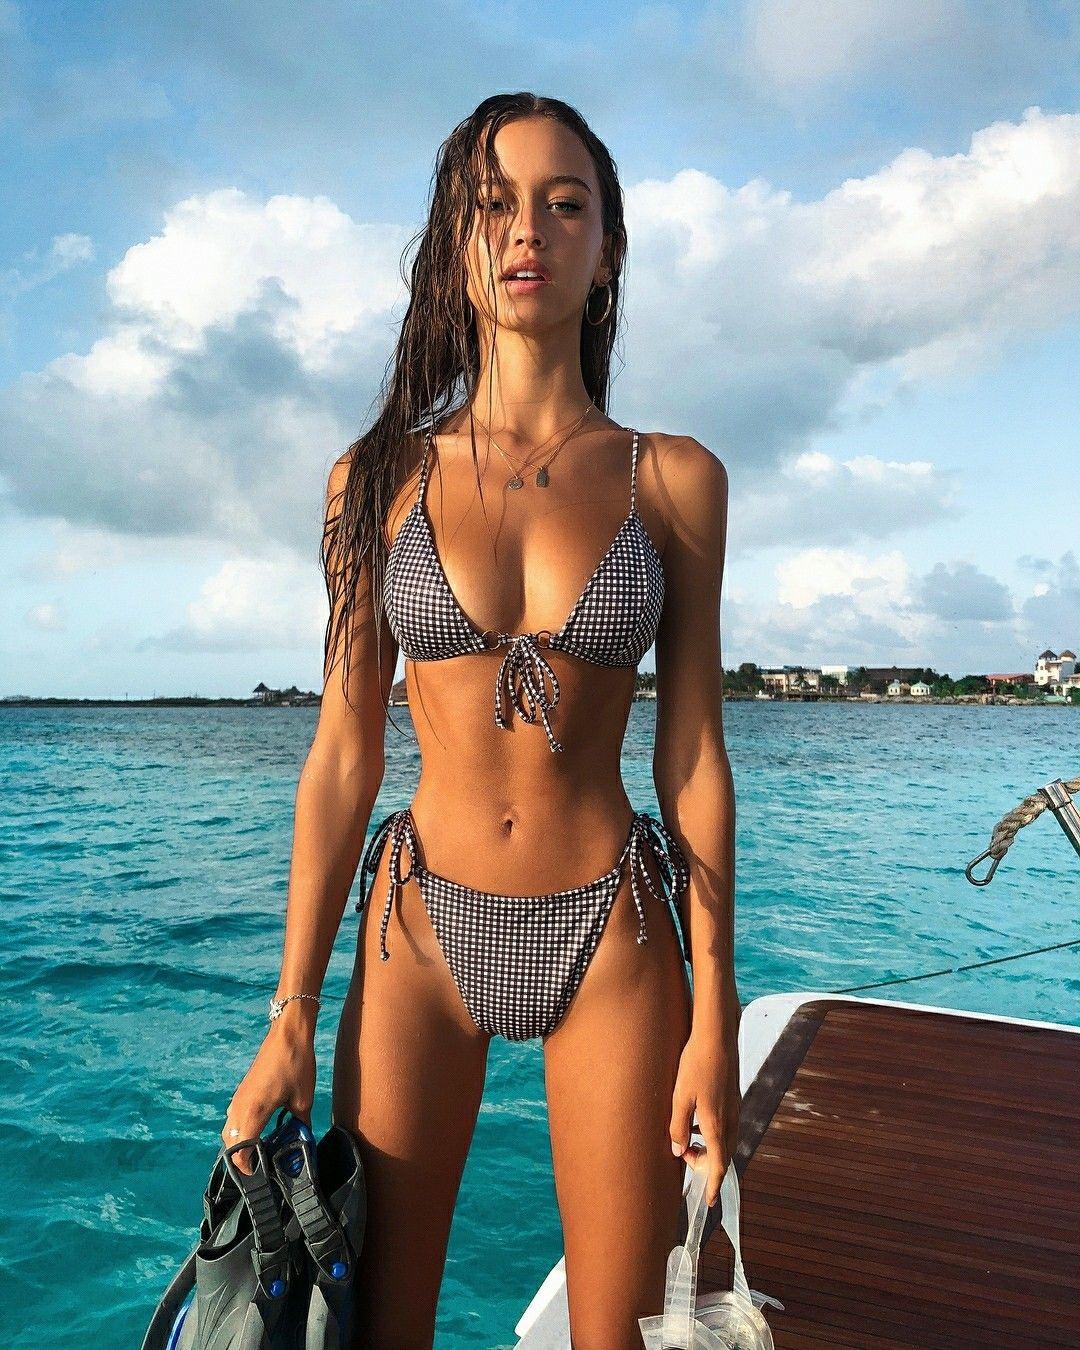 Bikini Emily Isabella nude photos 2019